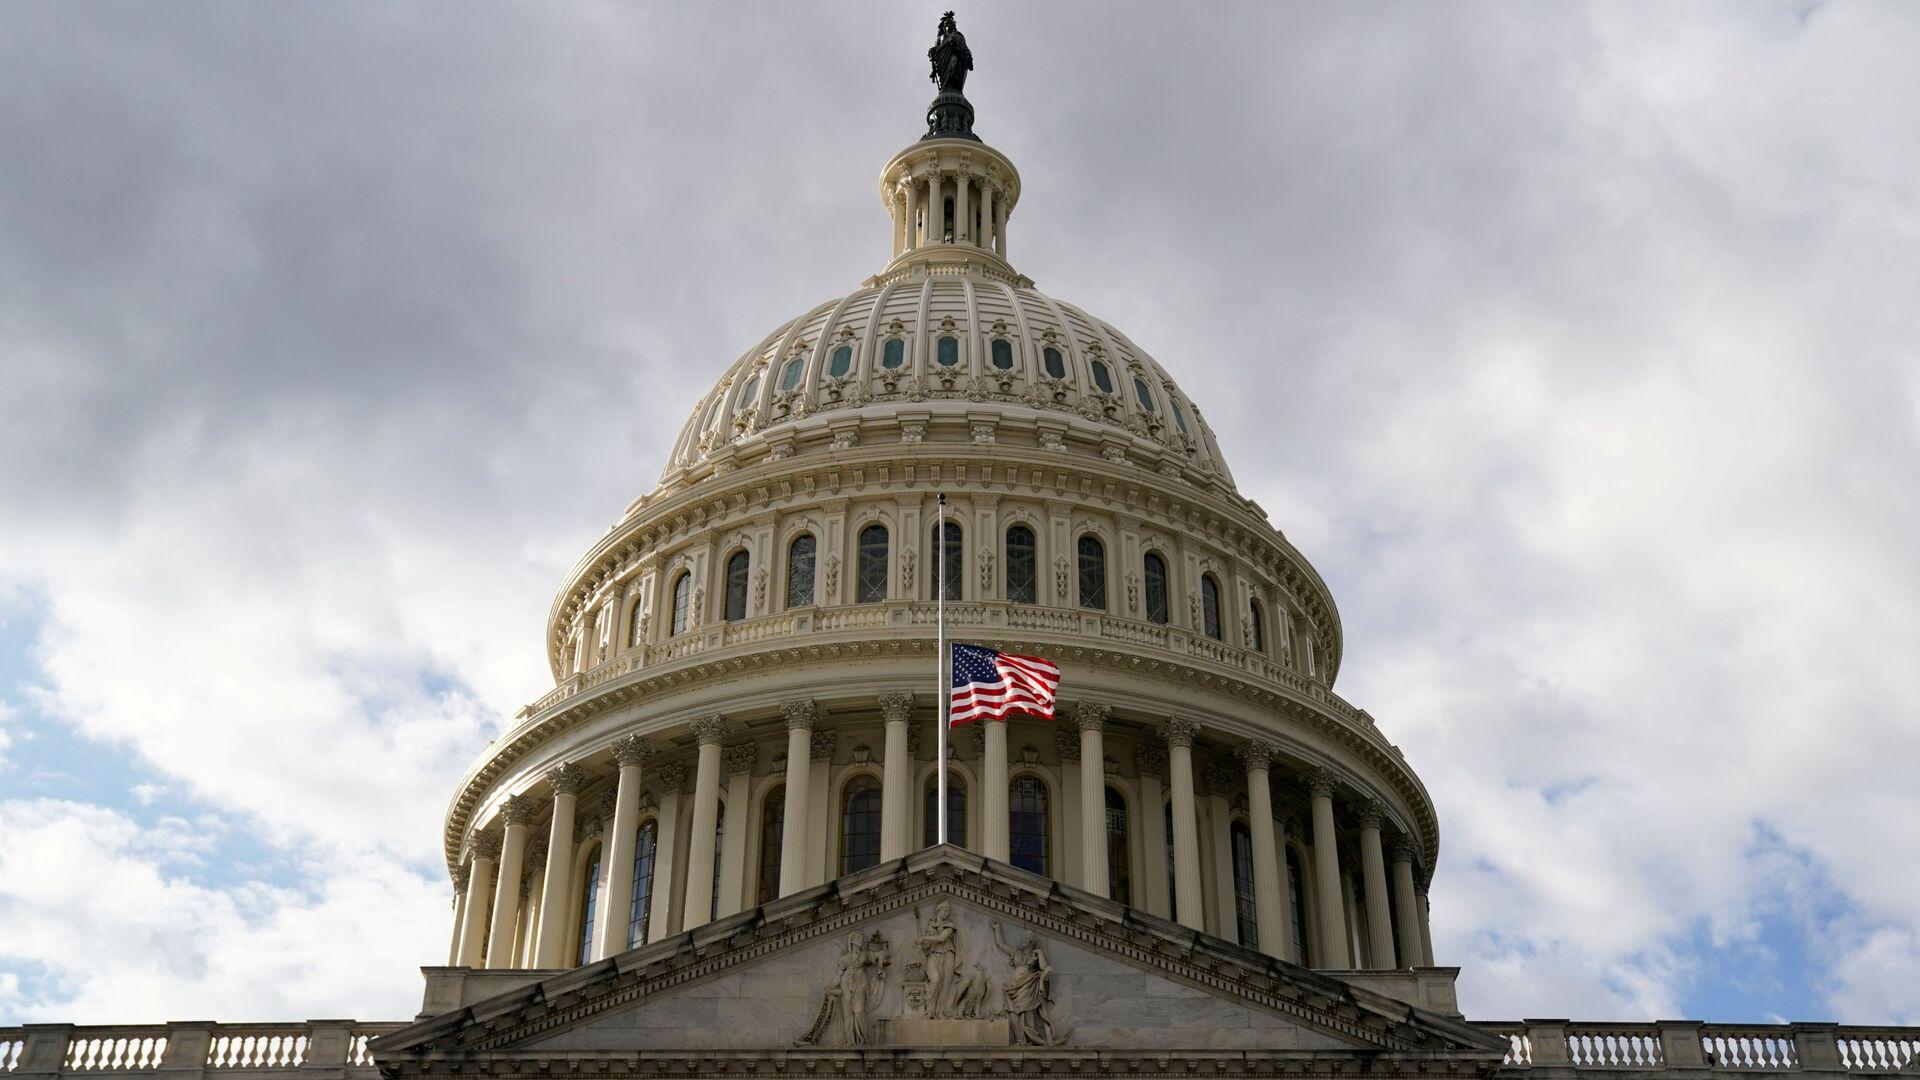 A view of the U.S. Capitol building in Washington DC, U.S. January 17, 2021. - Sputnik International, 1920, 20.09.2021